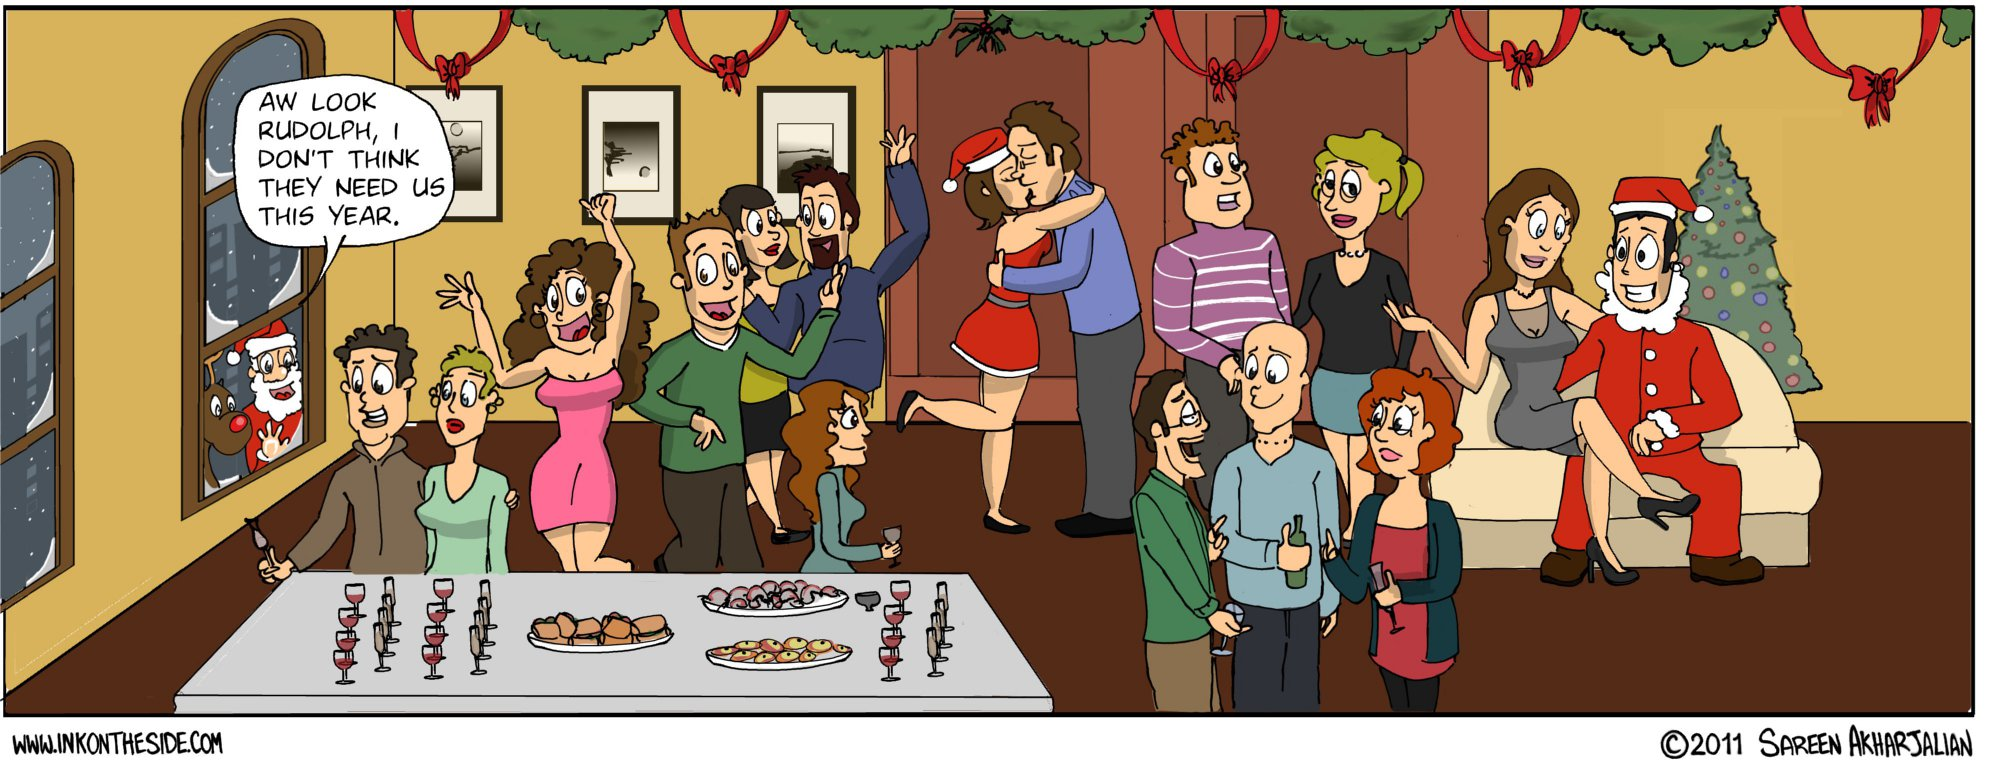 MERRY CHRISTMAS! (Another Christmas comic)